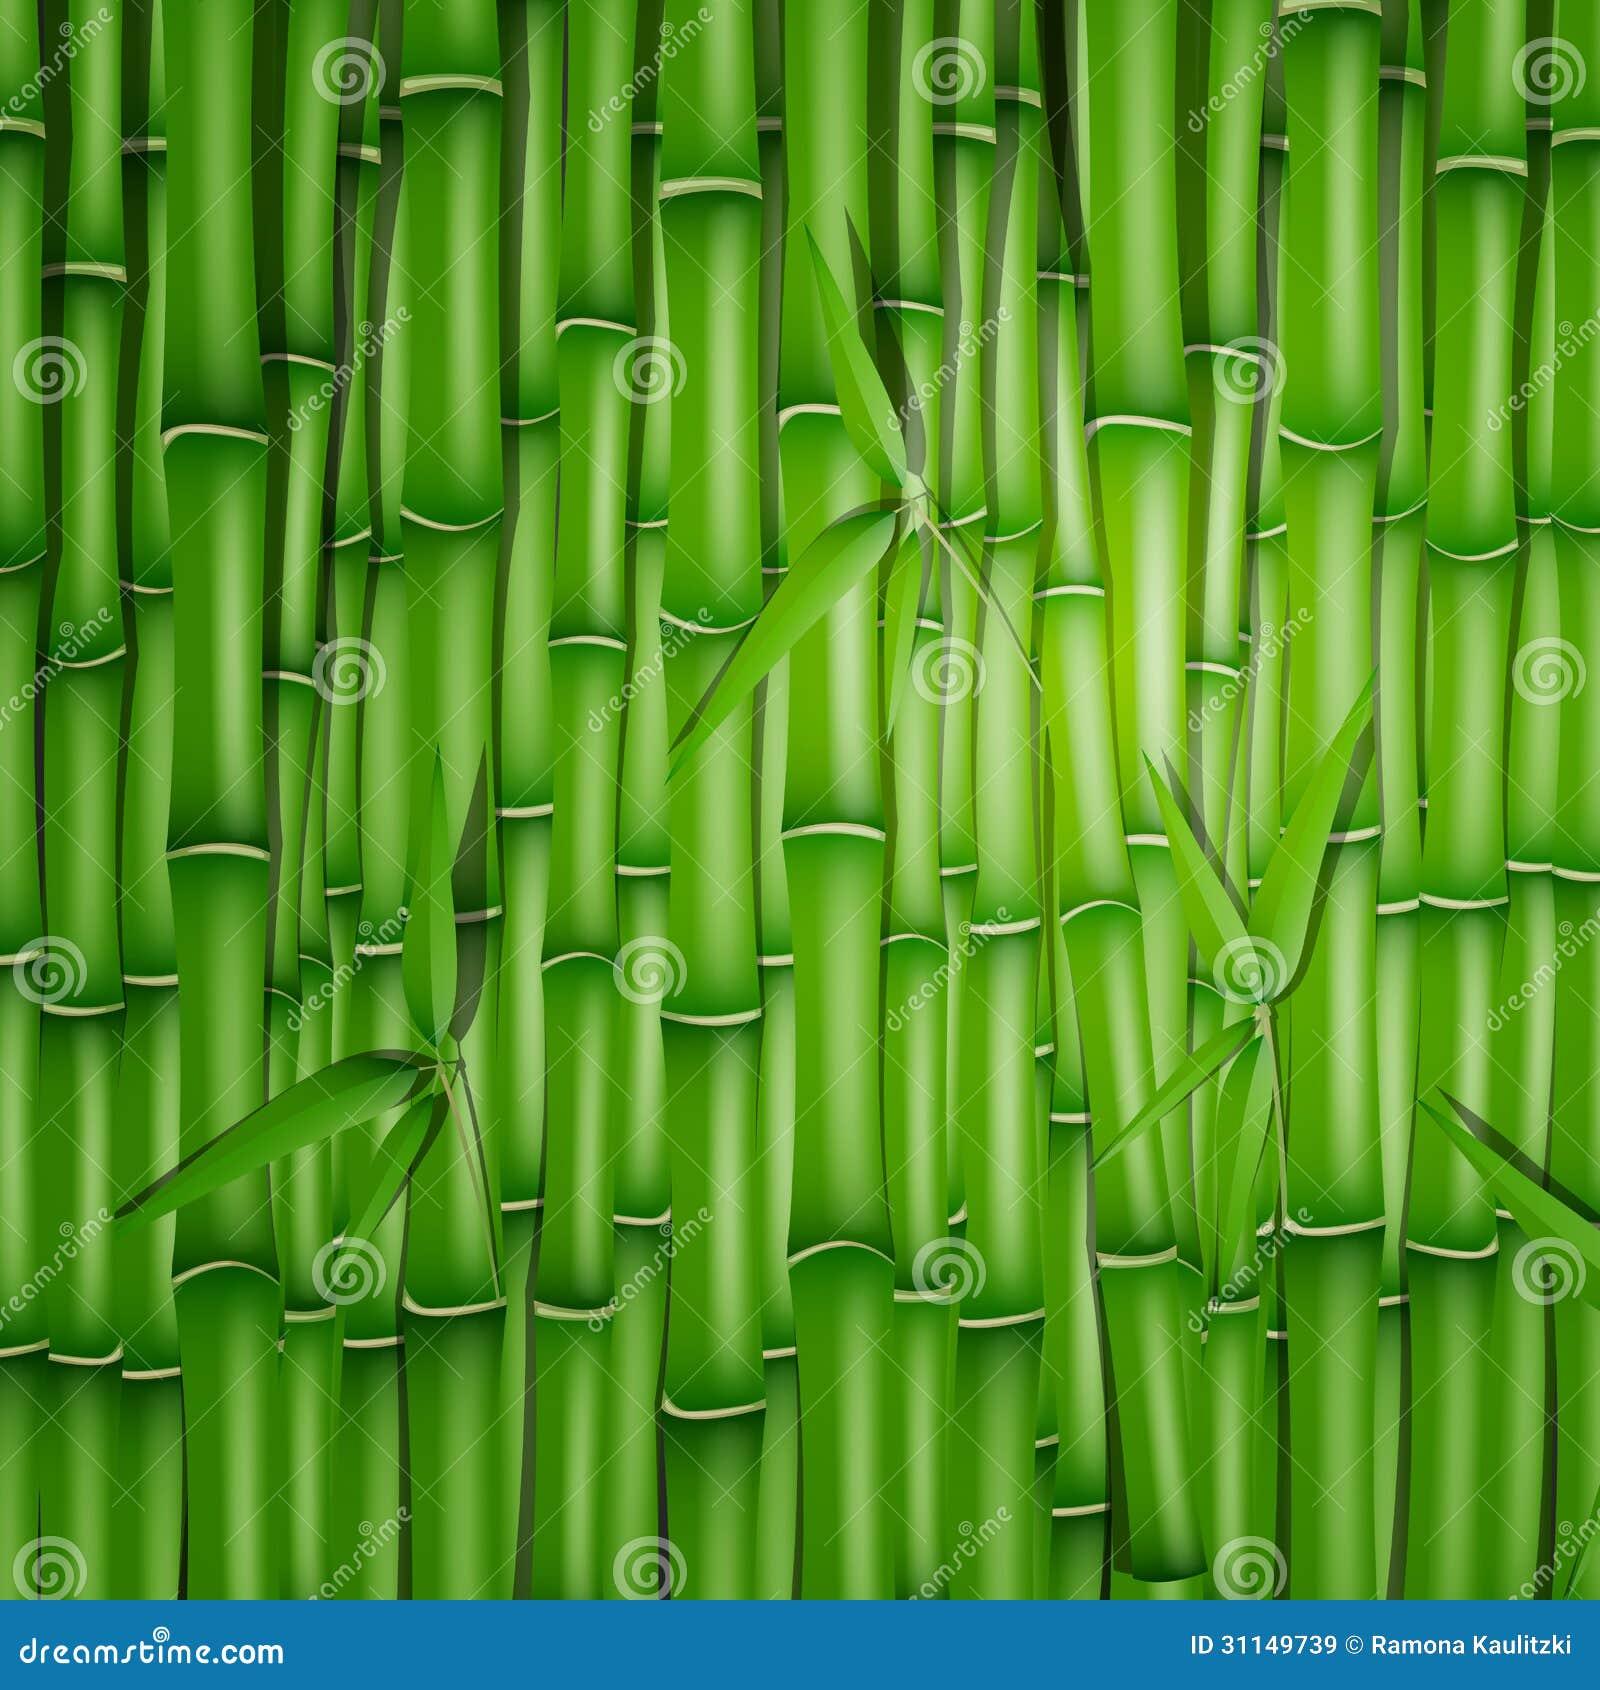 Bamboo Background Royalty Free Stock Images - Image: 31149739